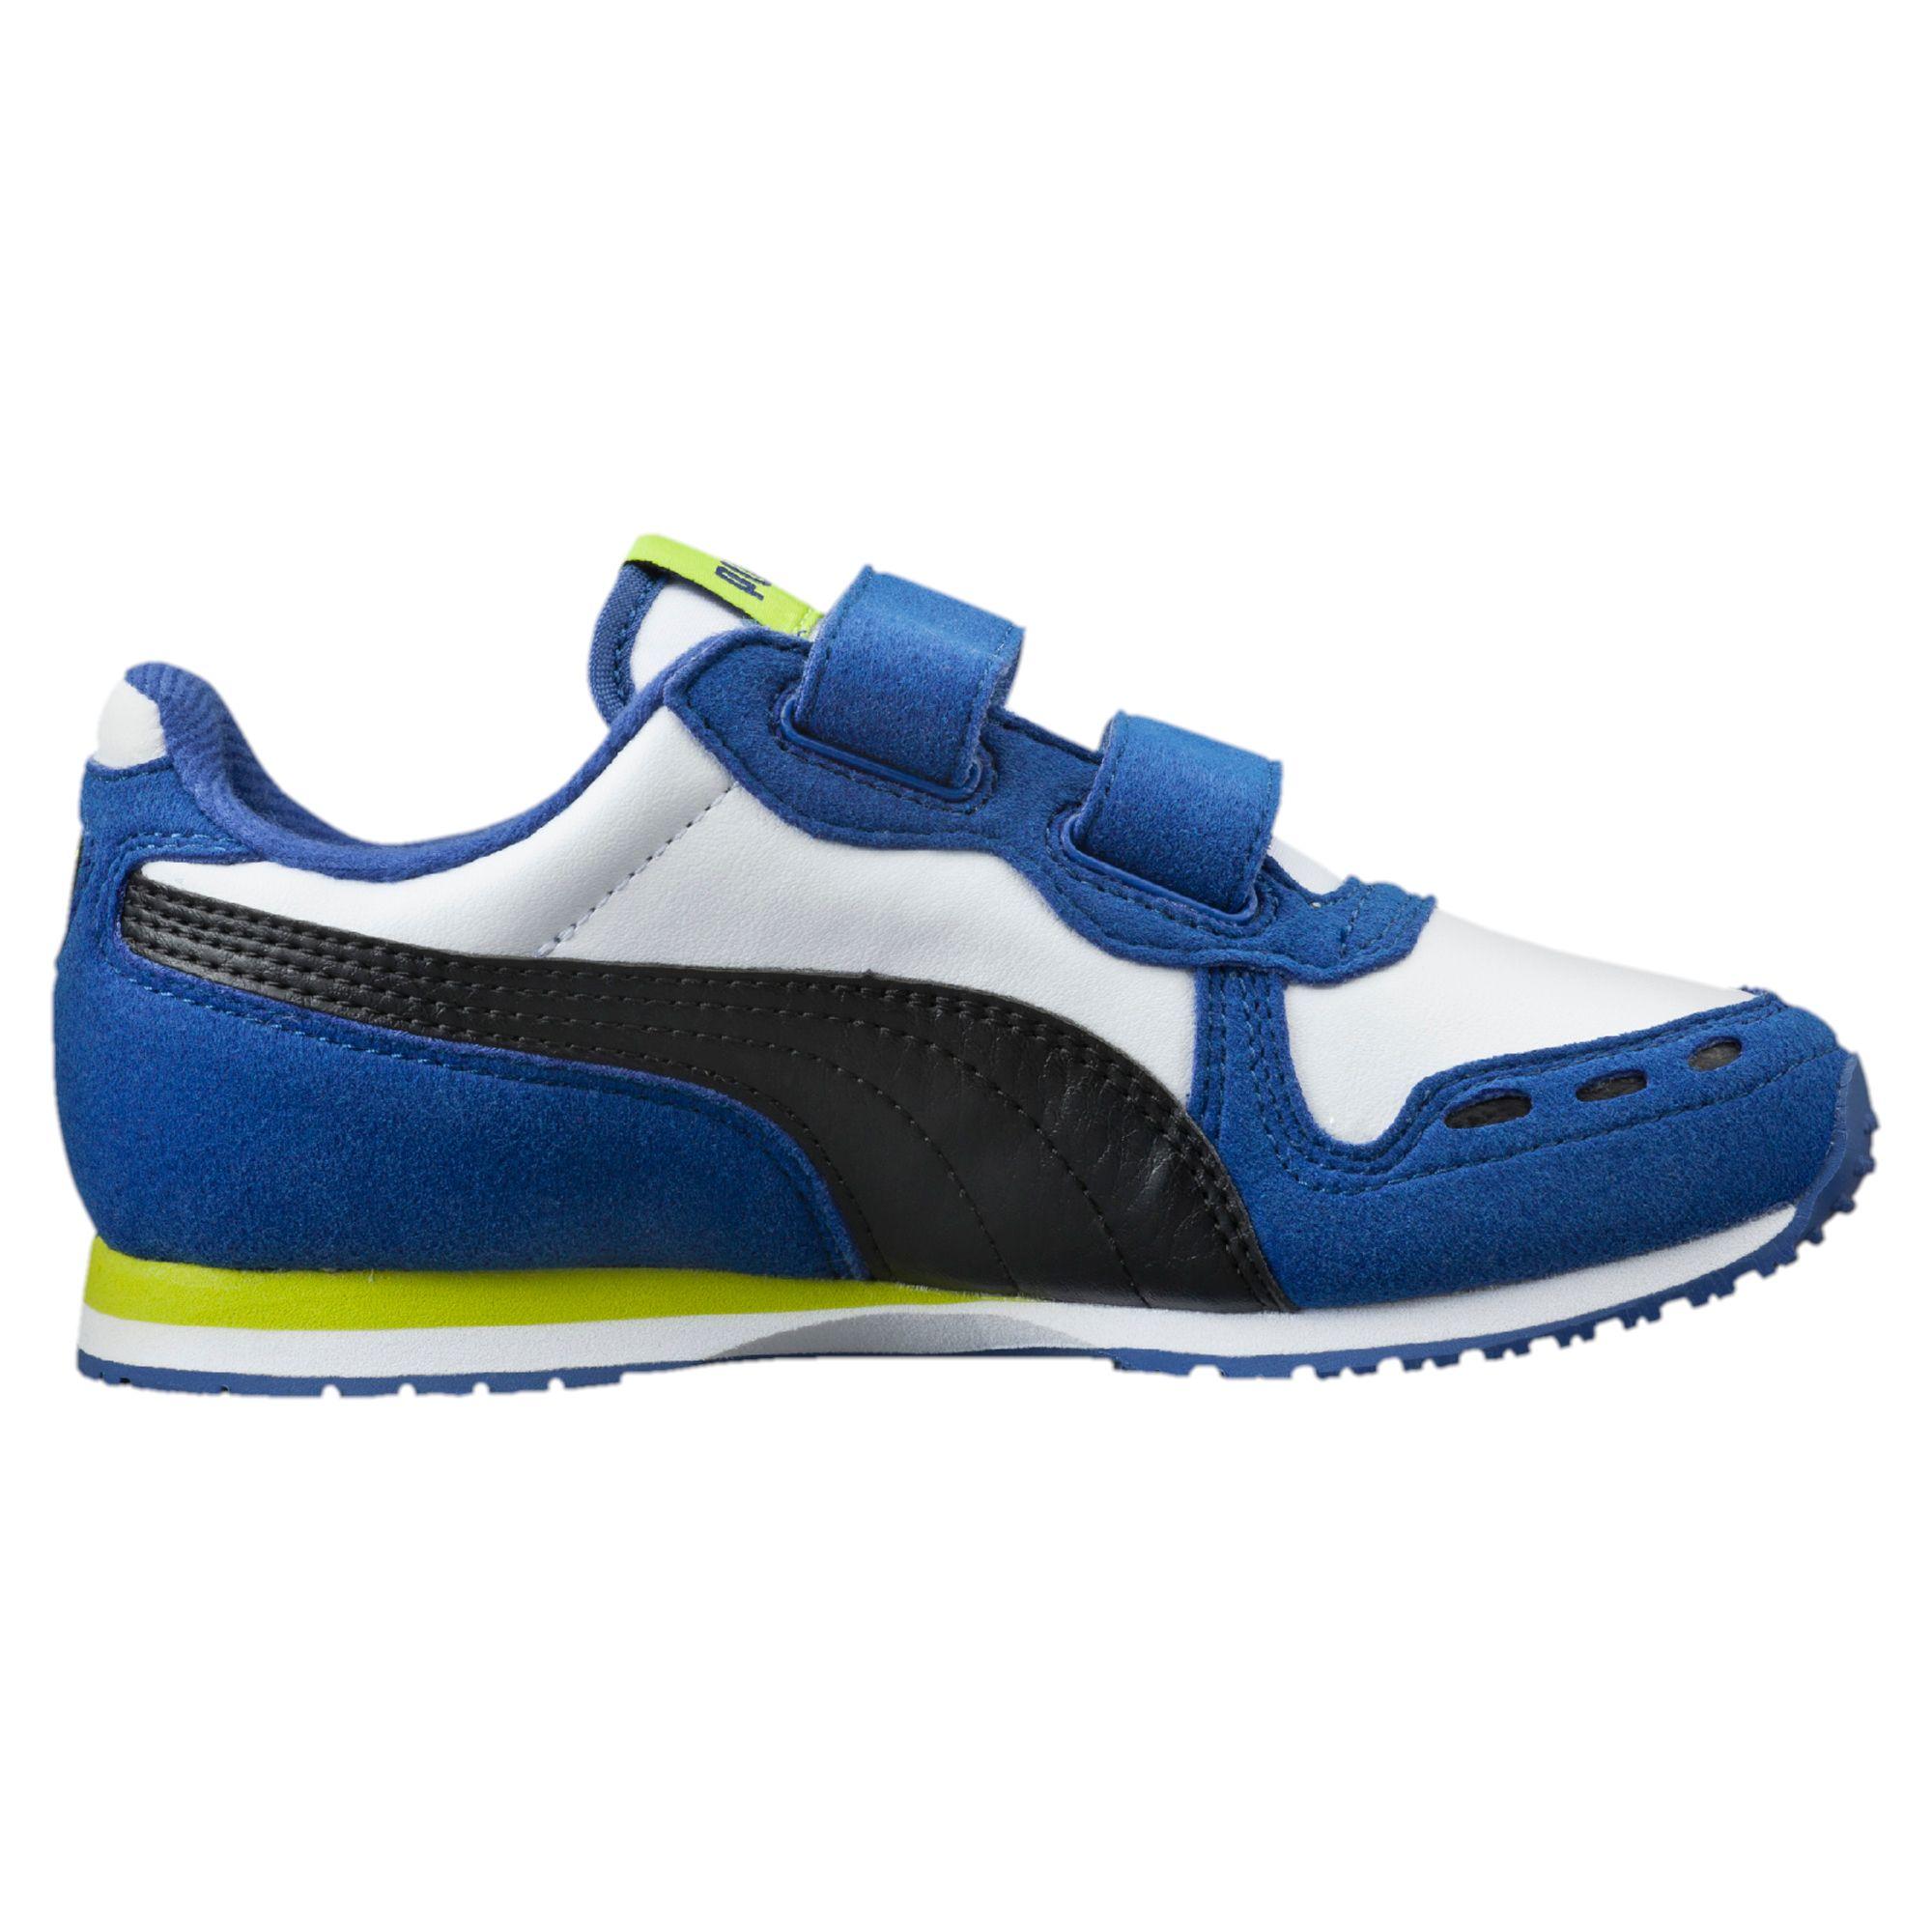 Pumas Cabana Coureur Sneaker V Ps Sl Enfants Unisexe - Blanc - 31 Eu KBH1qQZ